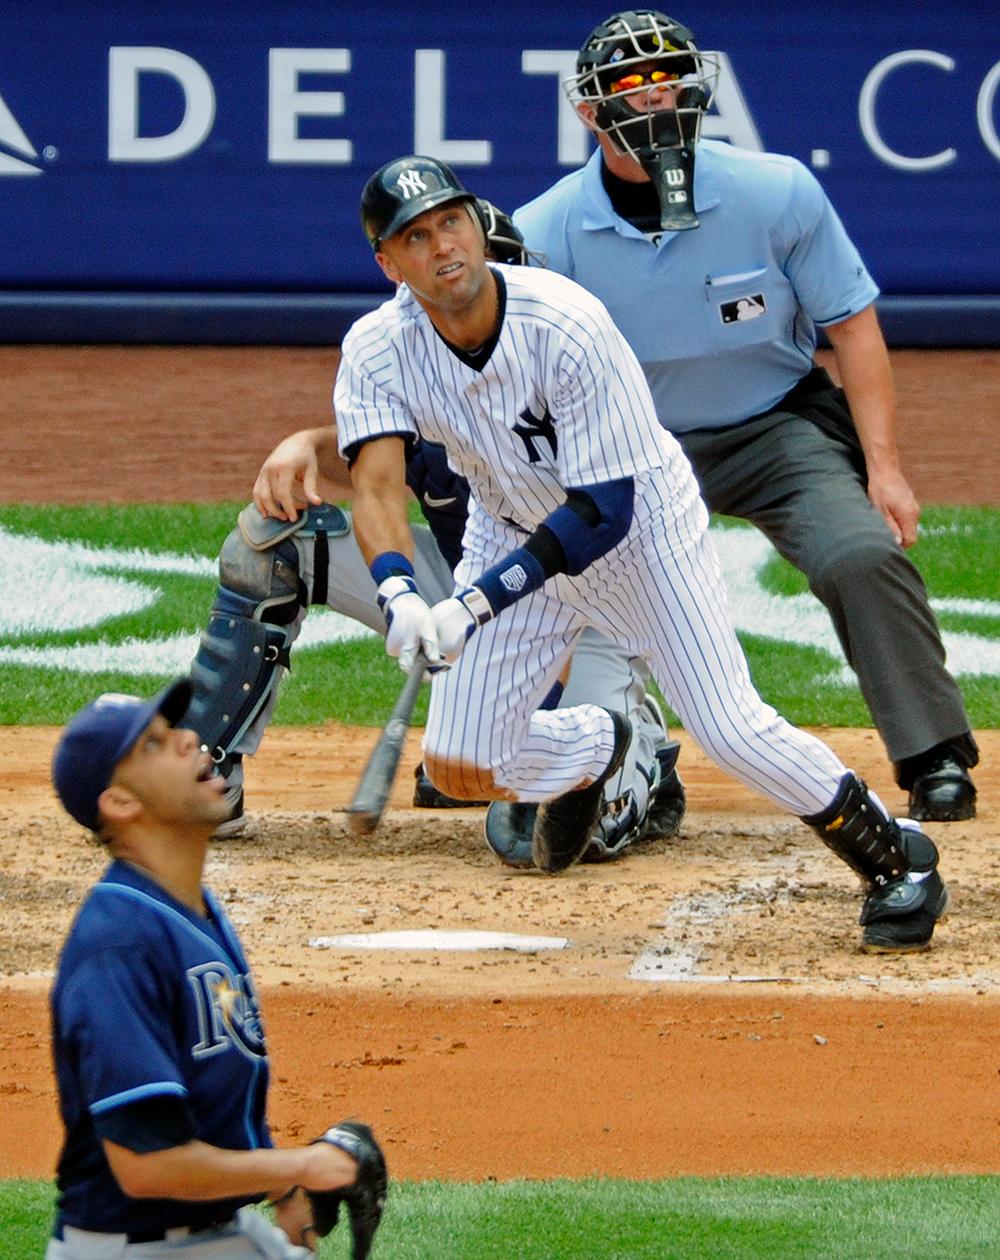 The moments that define Derek Jeter